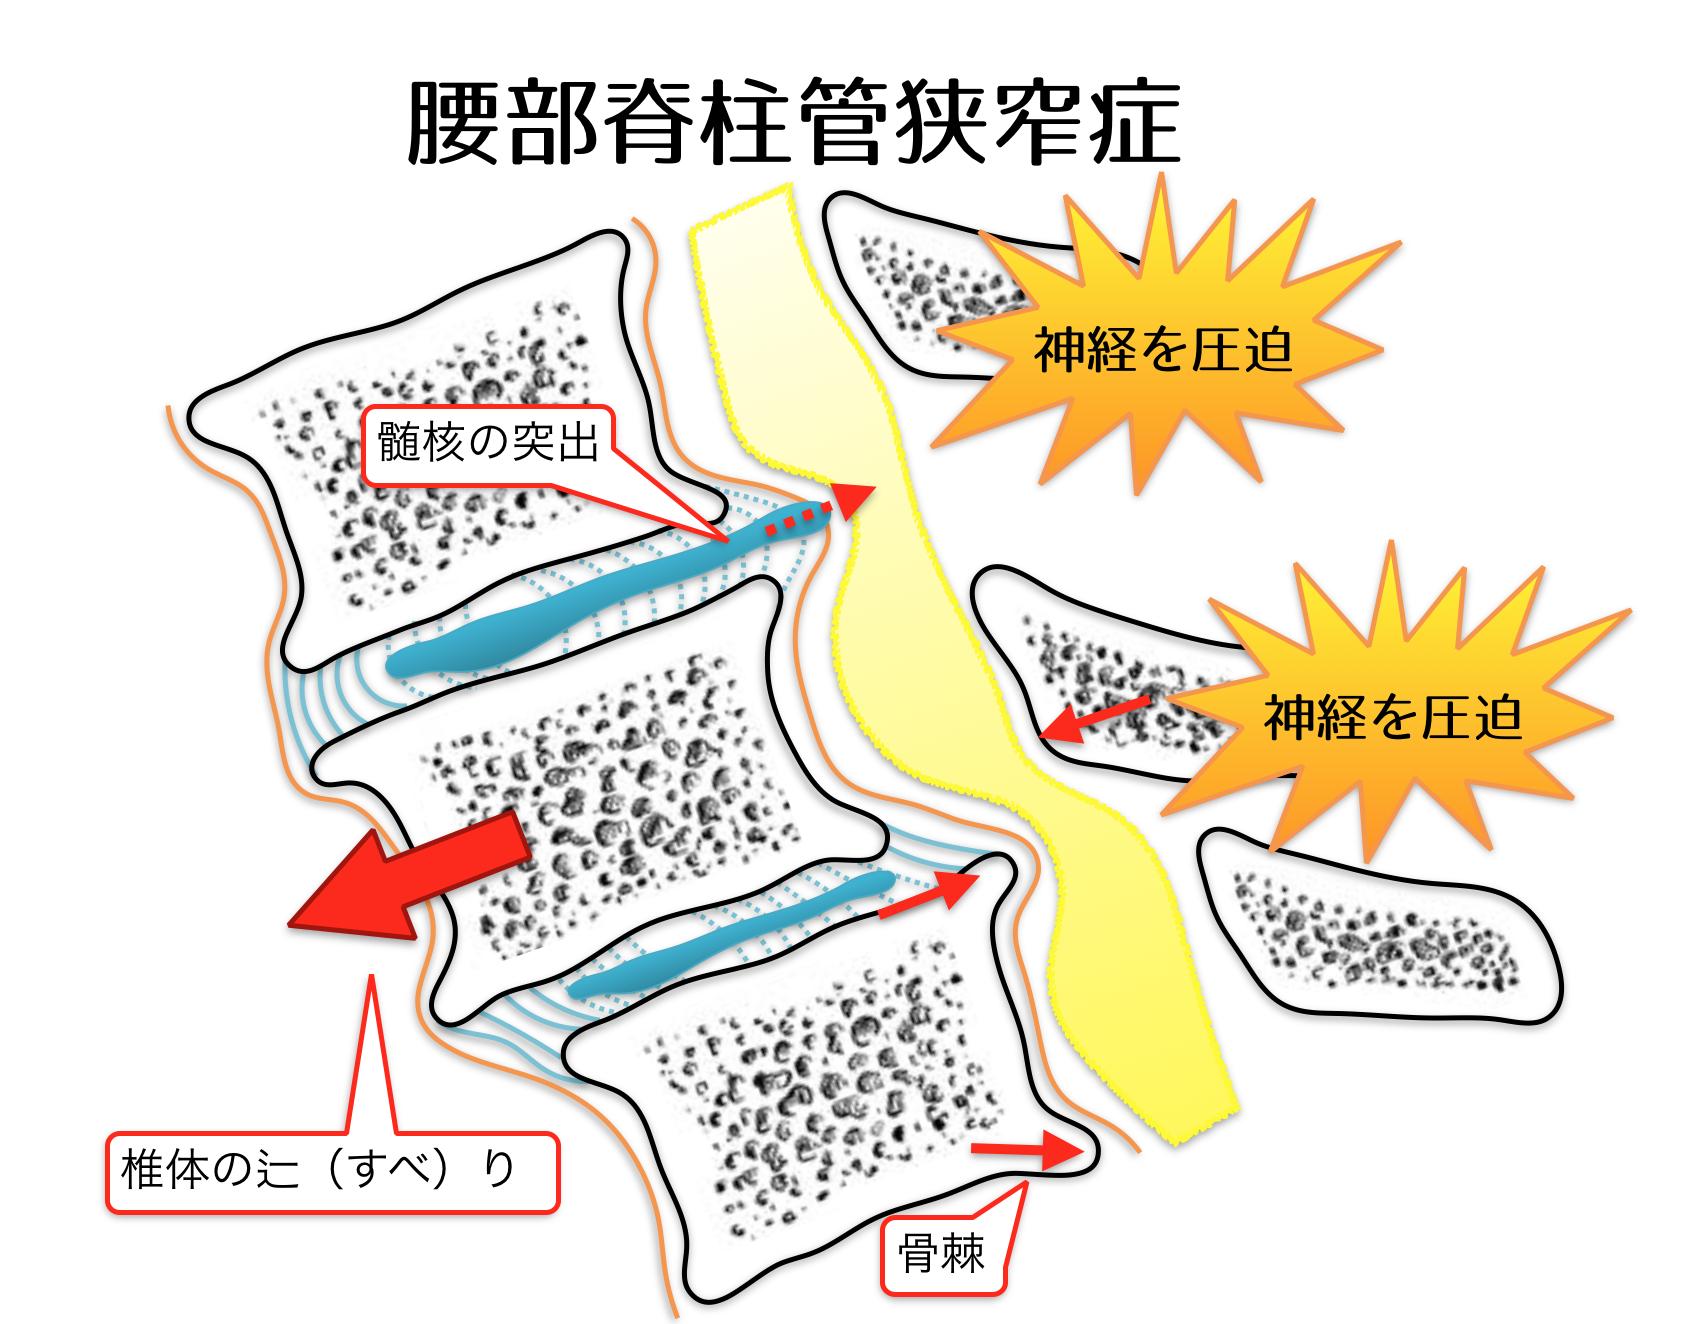 腰部脊柱管狭窄症の病態